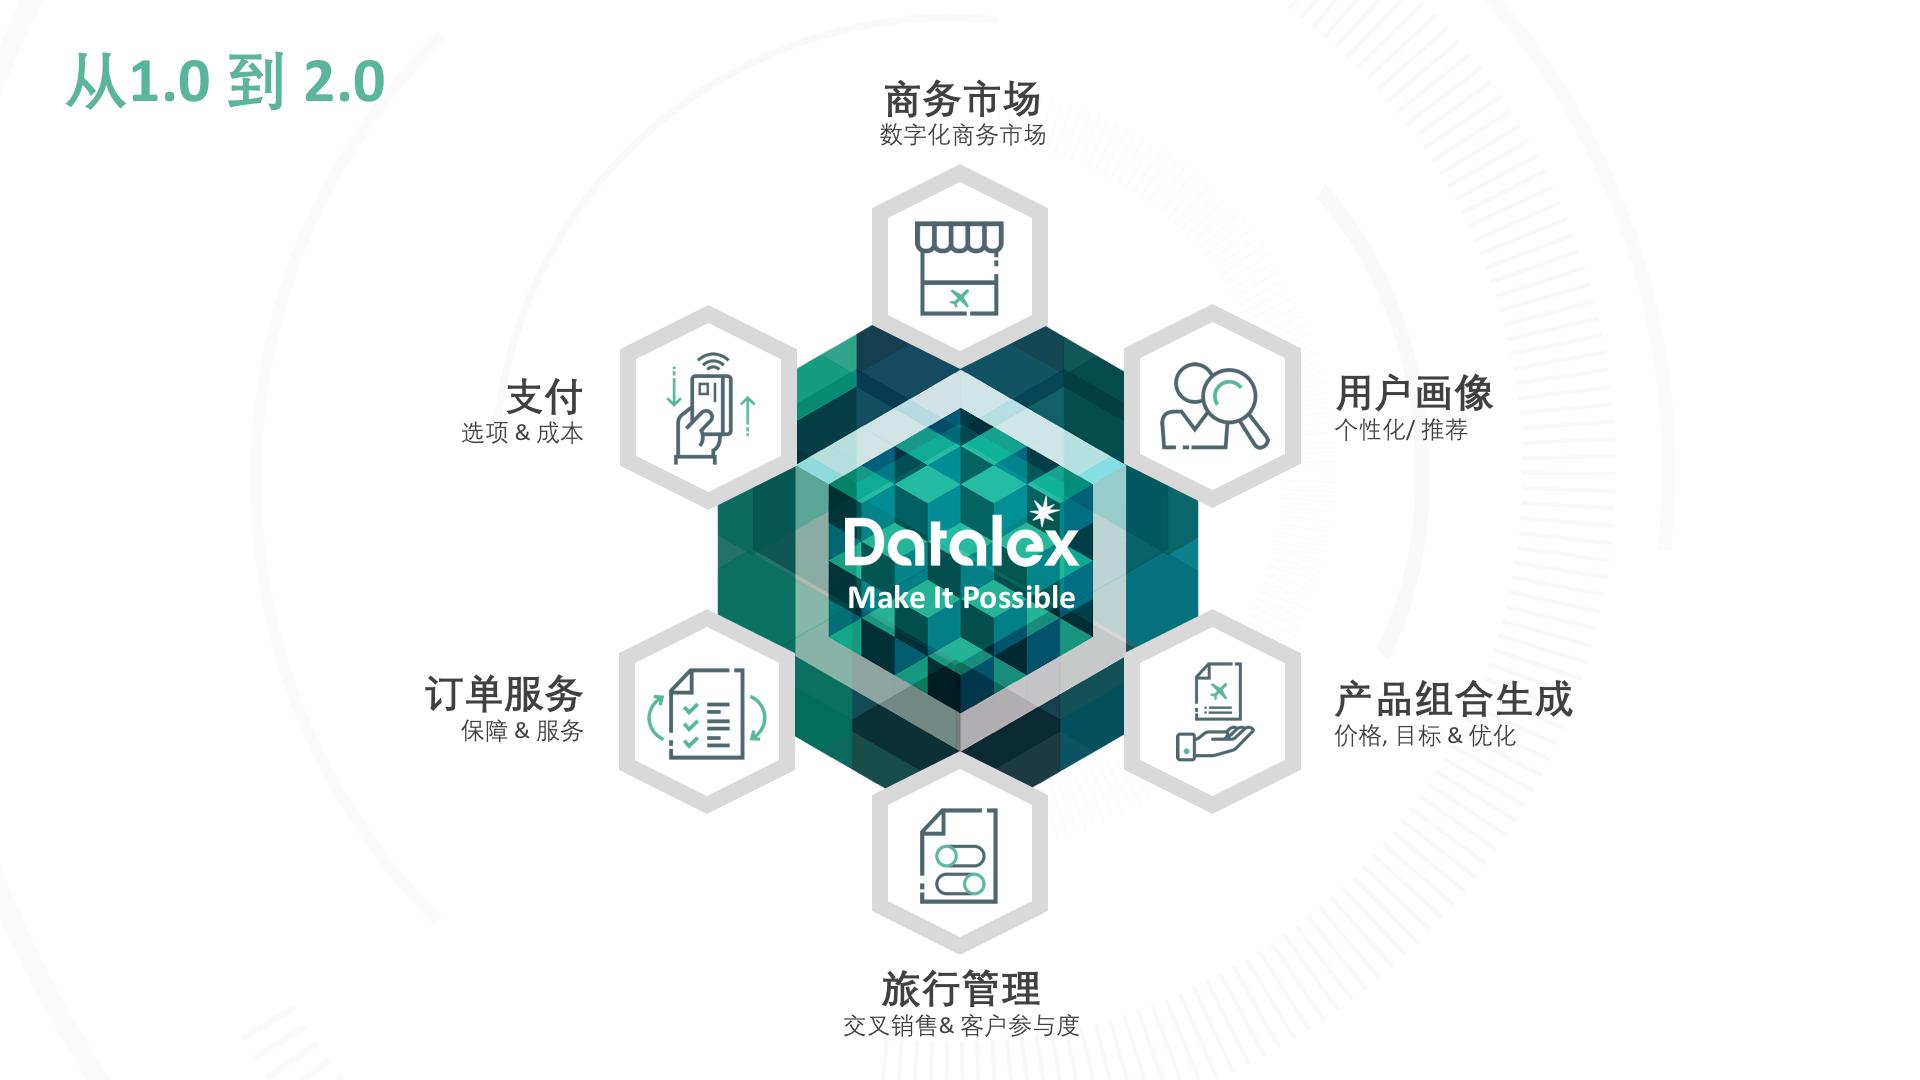 Travel Retail Outlook Datalex